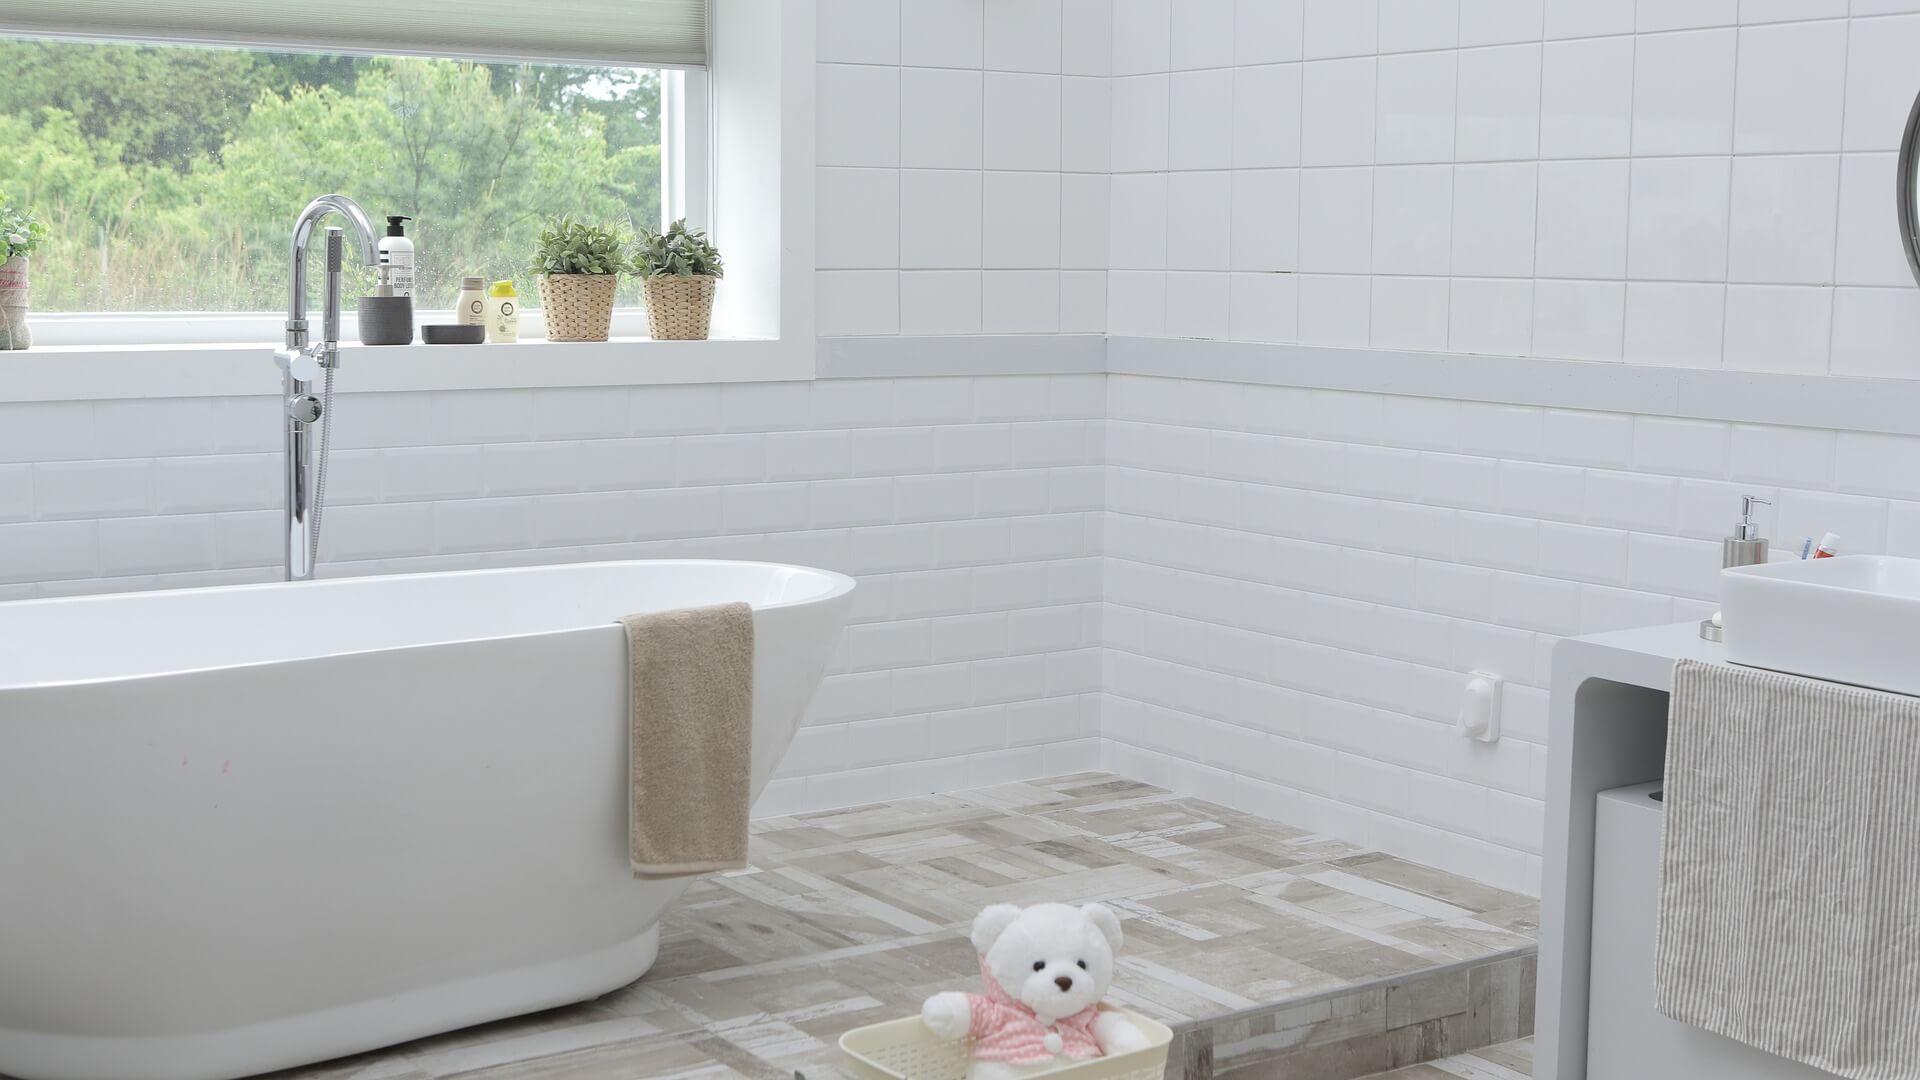 Kitchens and Bathrooms - Bathroom renovation at Hamilton